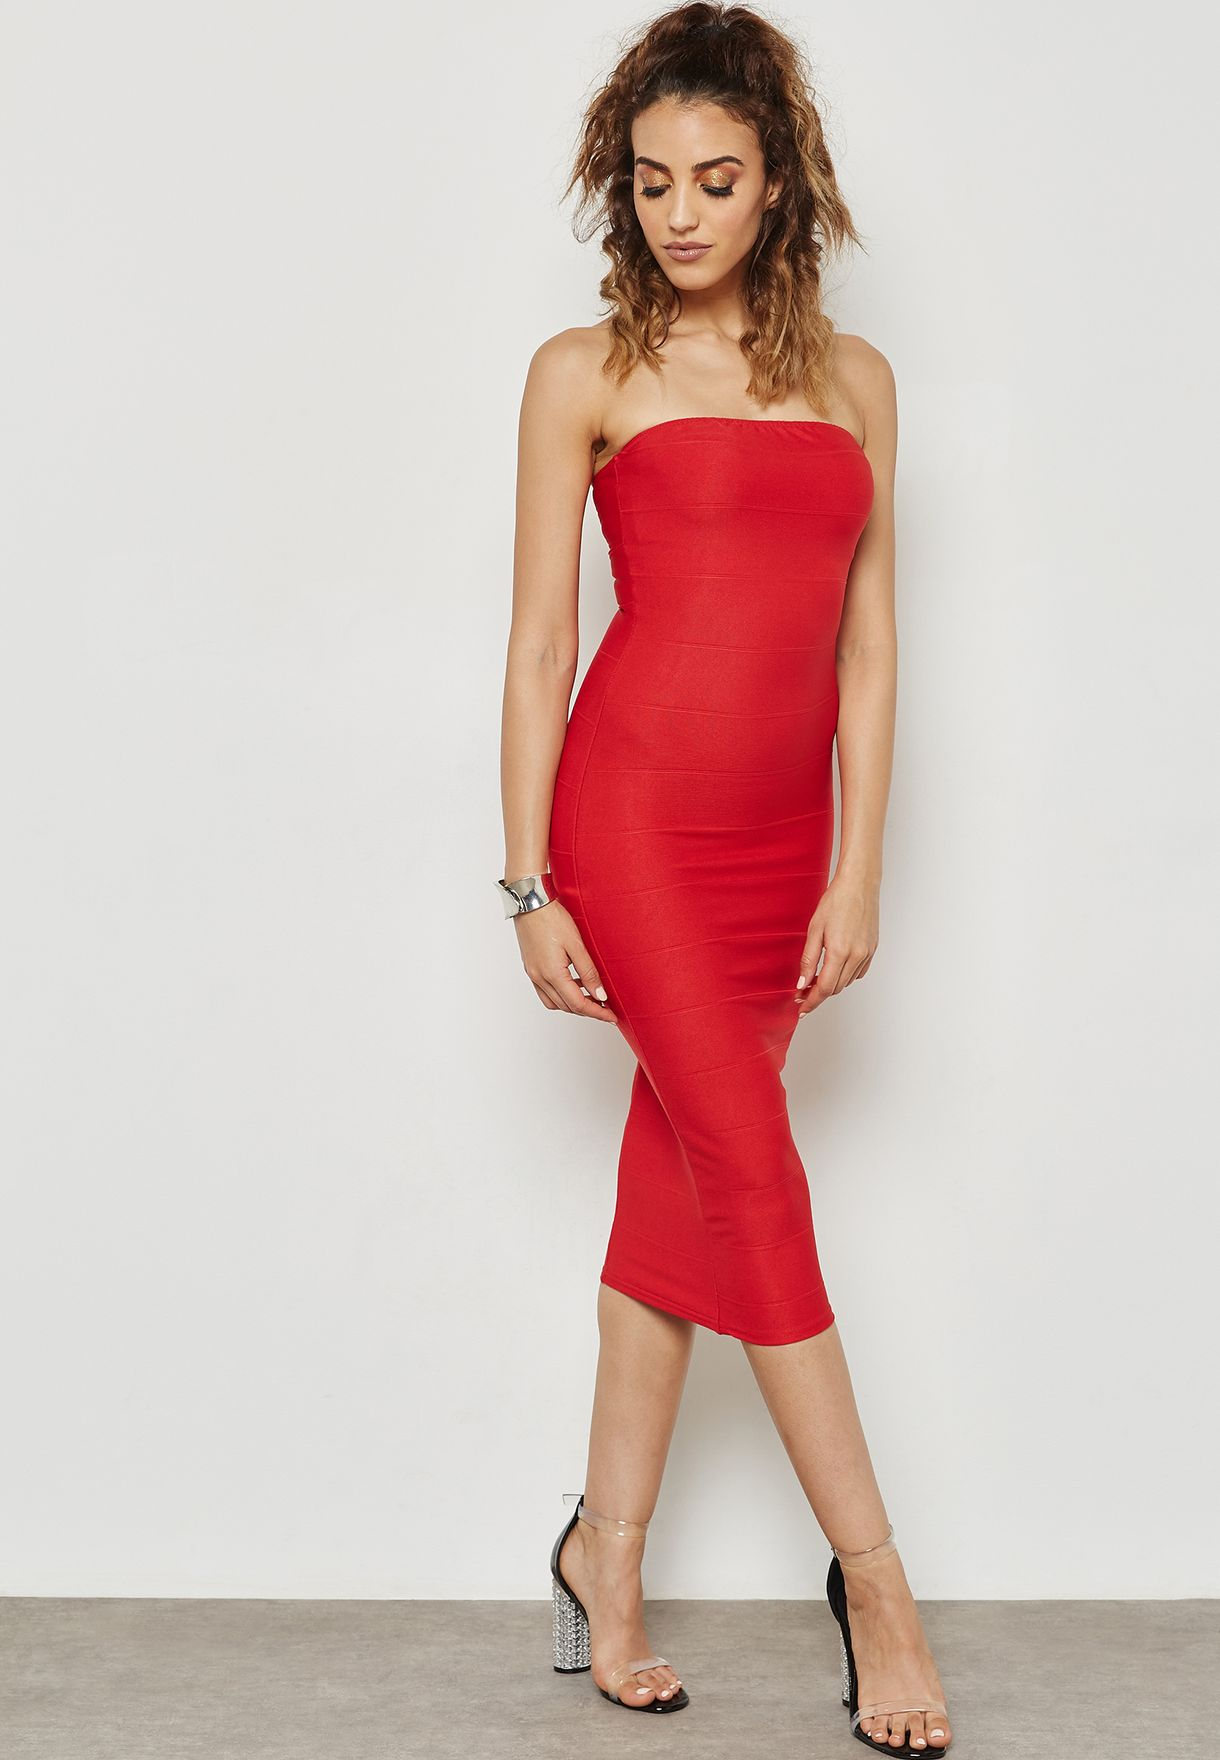 Red Strapless Bandage Dress